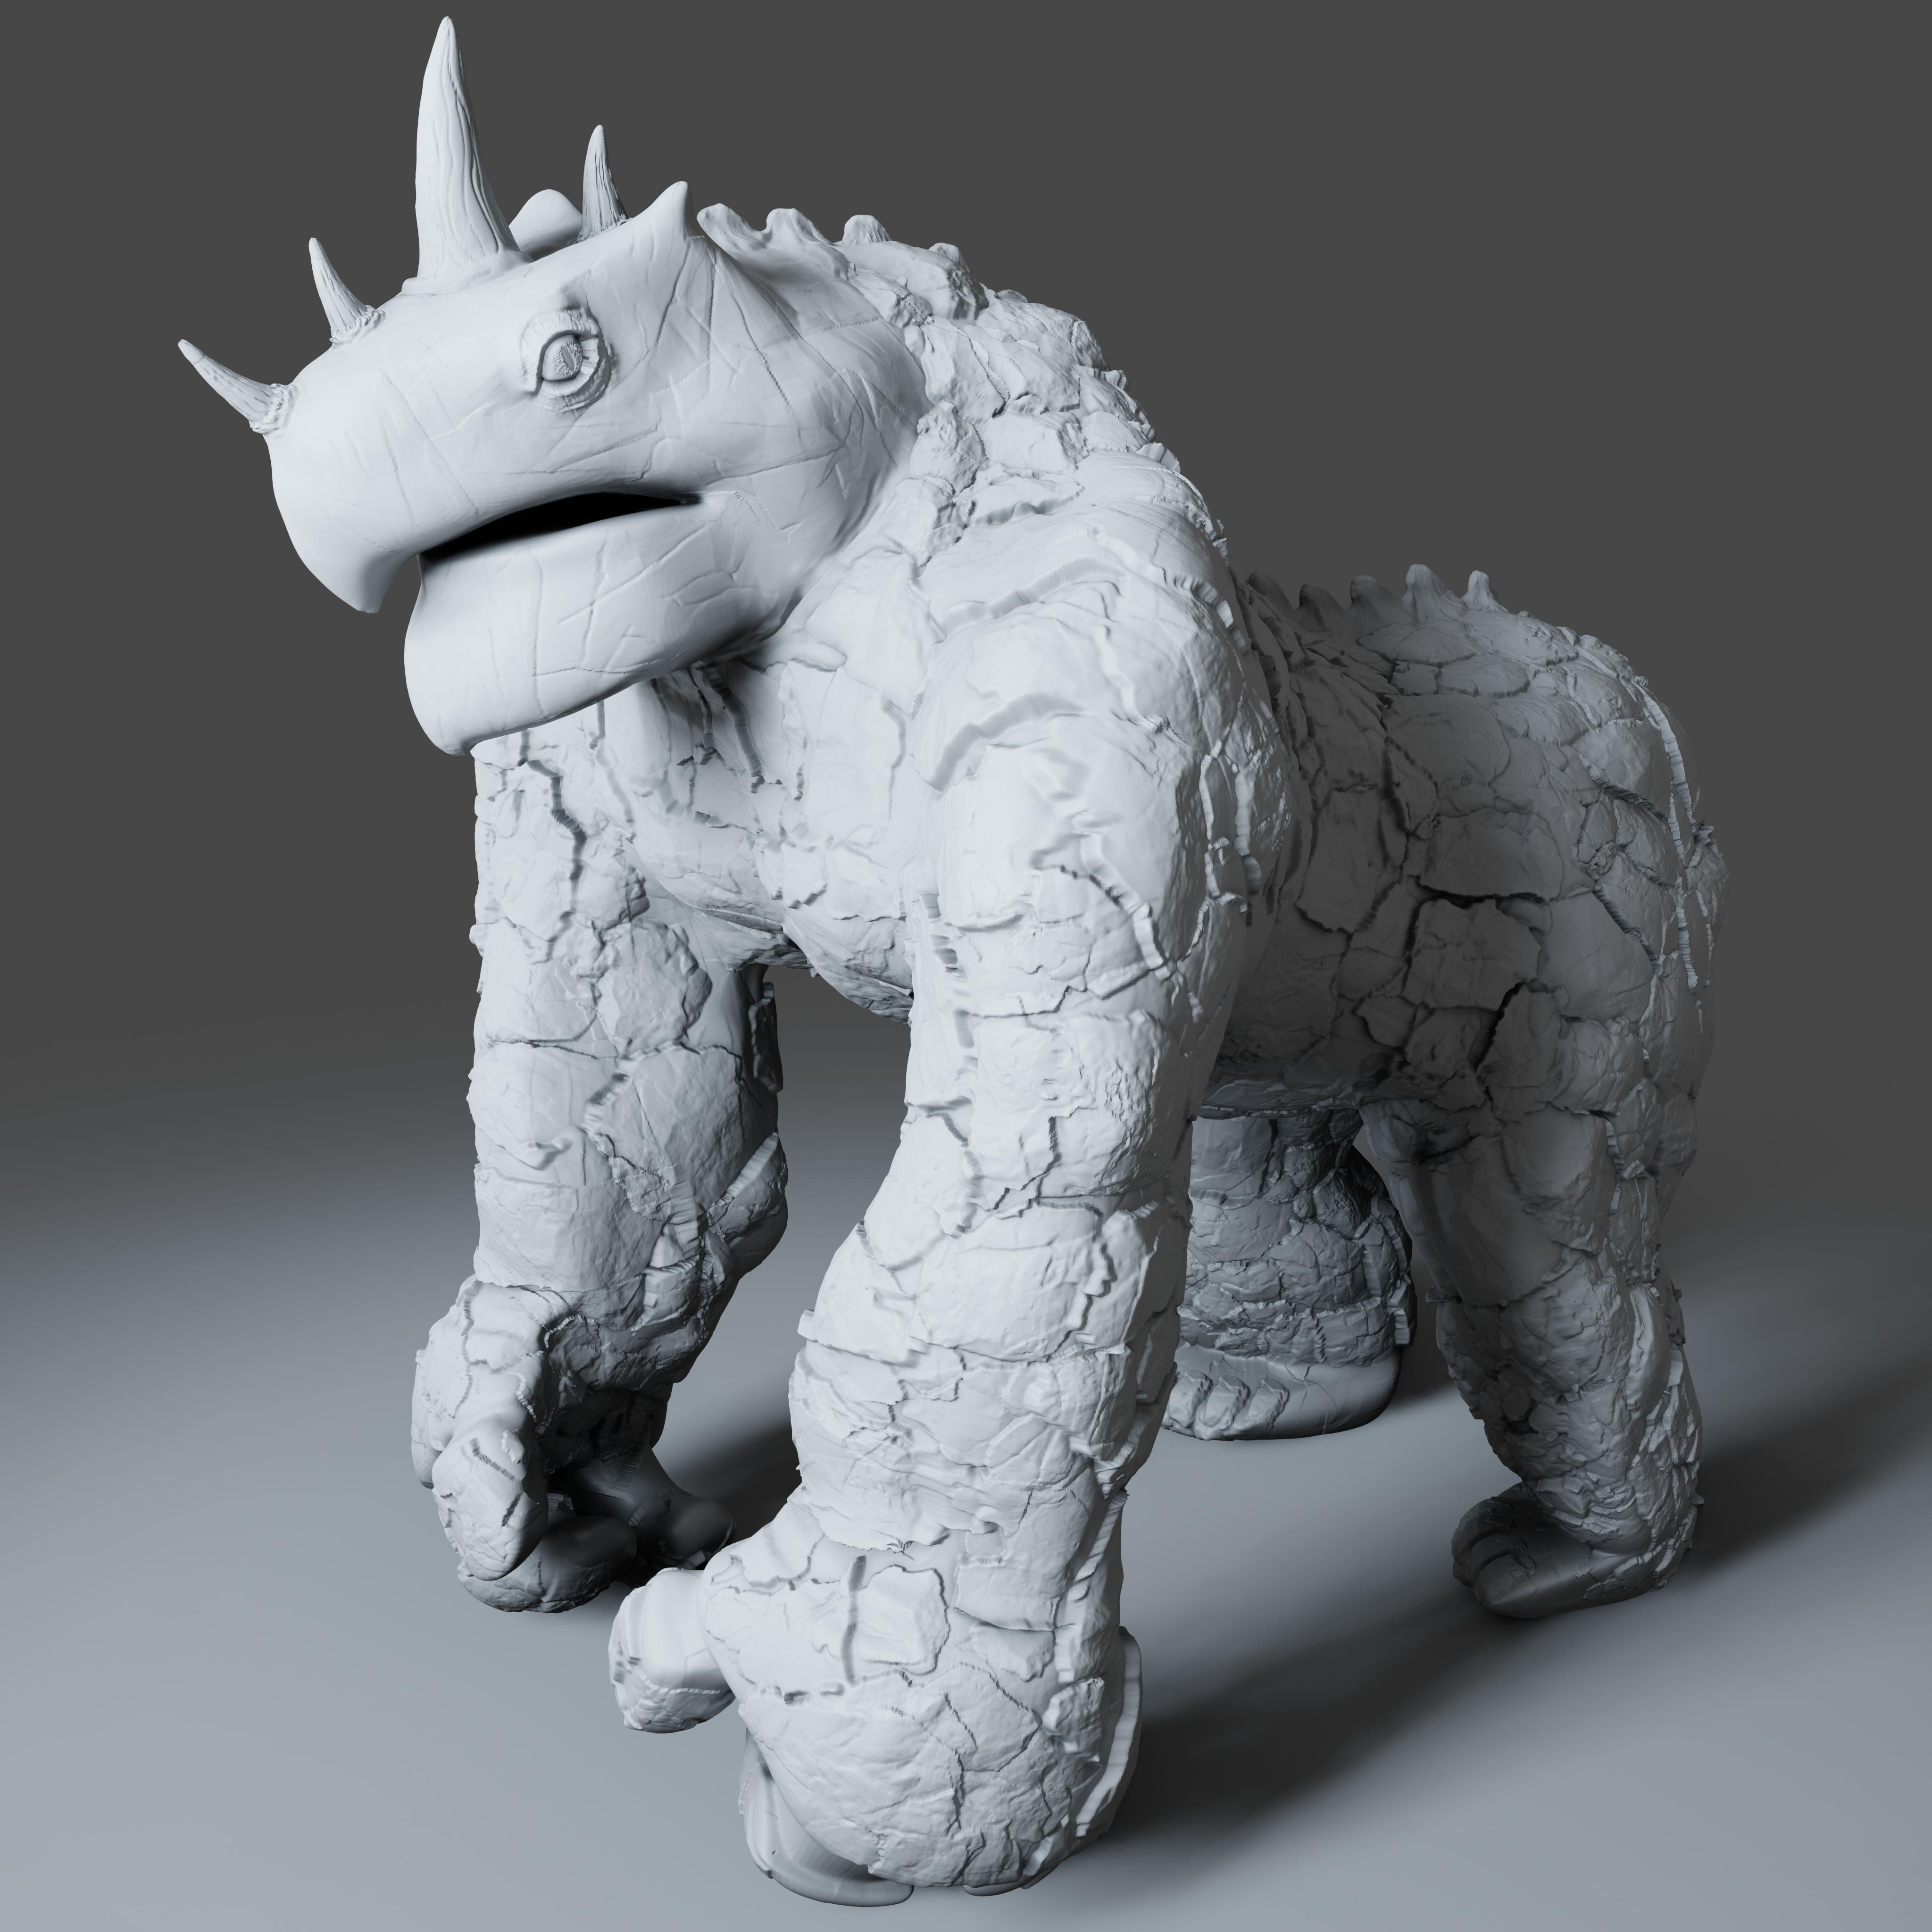 Preview2.jpg Download STL file Gorilla Turtle Monster - 3D Print Model • 3D printer object, DudeX